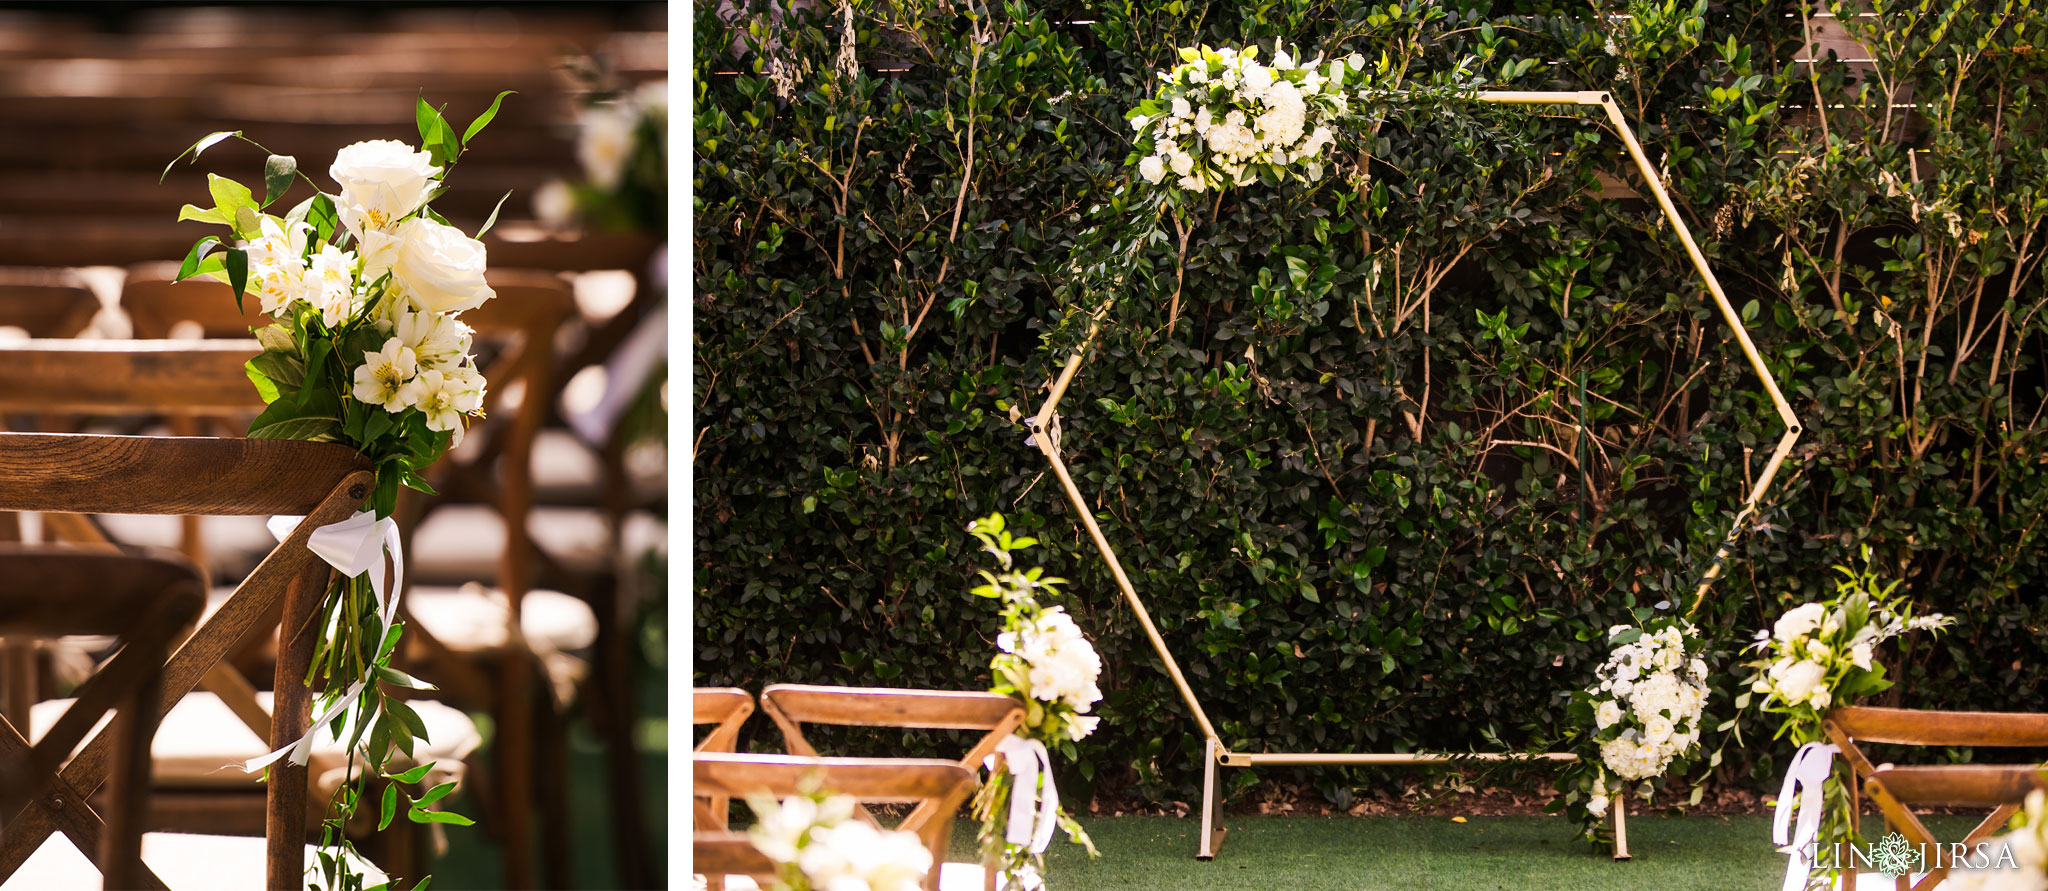 018 york manor los angeles wedding ceremony photography